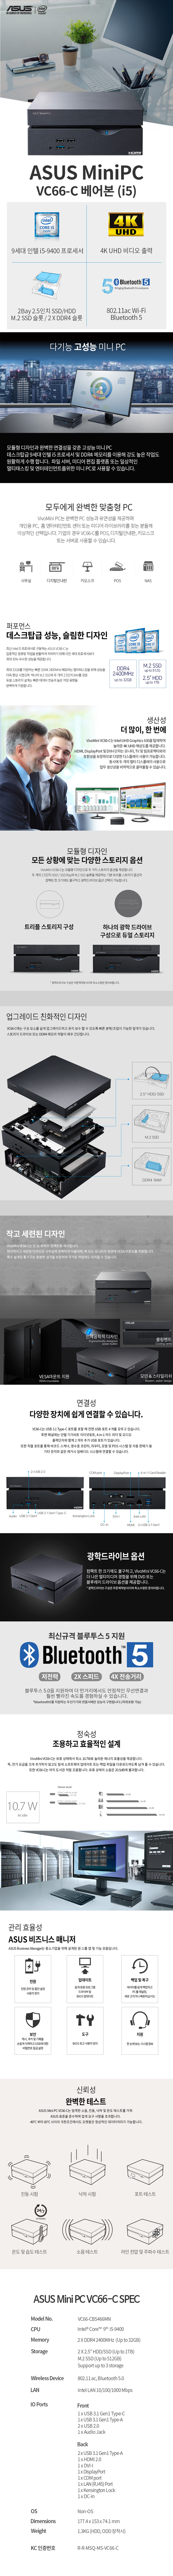 ASUS VivoMini VC66-C i5-9400 M2 (32GB, M2 1TB)